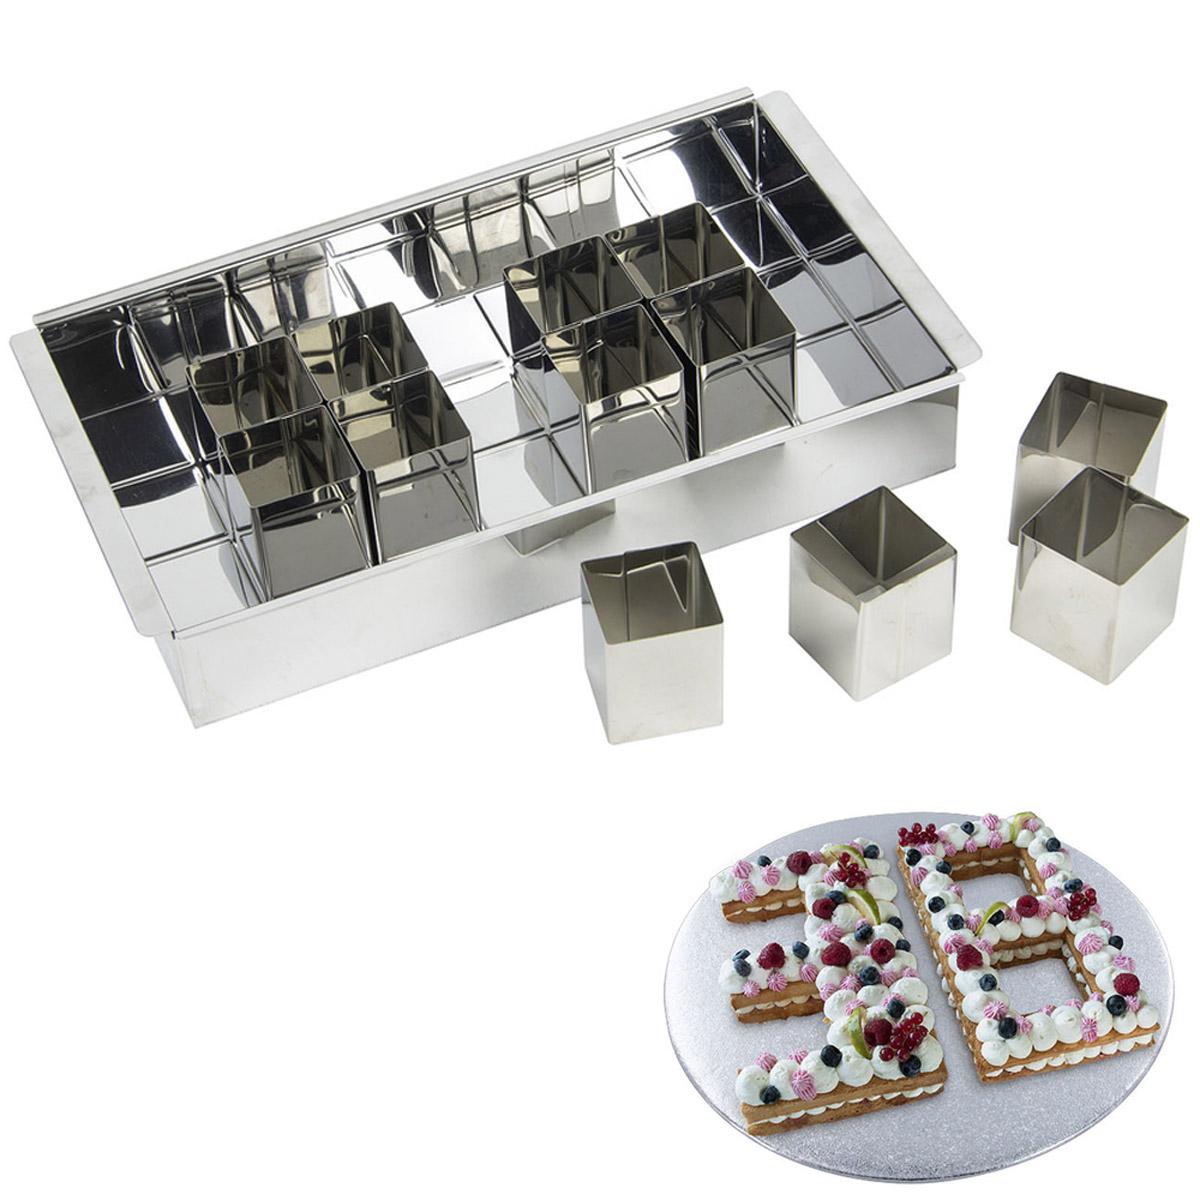 Moule inox \'Number Cake\' - 31x18x5 cm (12 cubes) - [R2457]